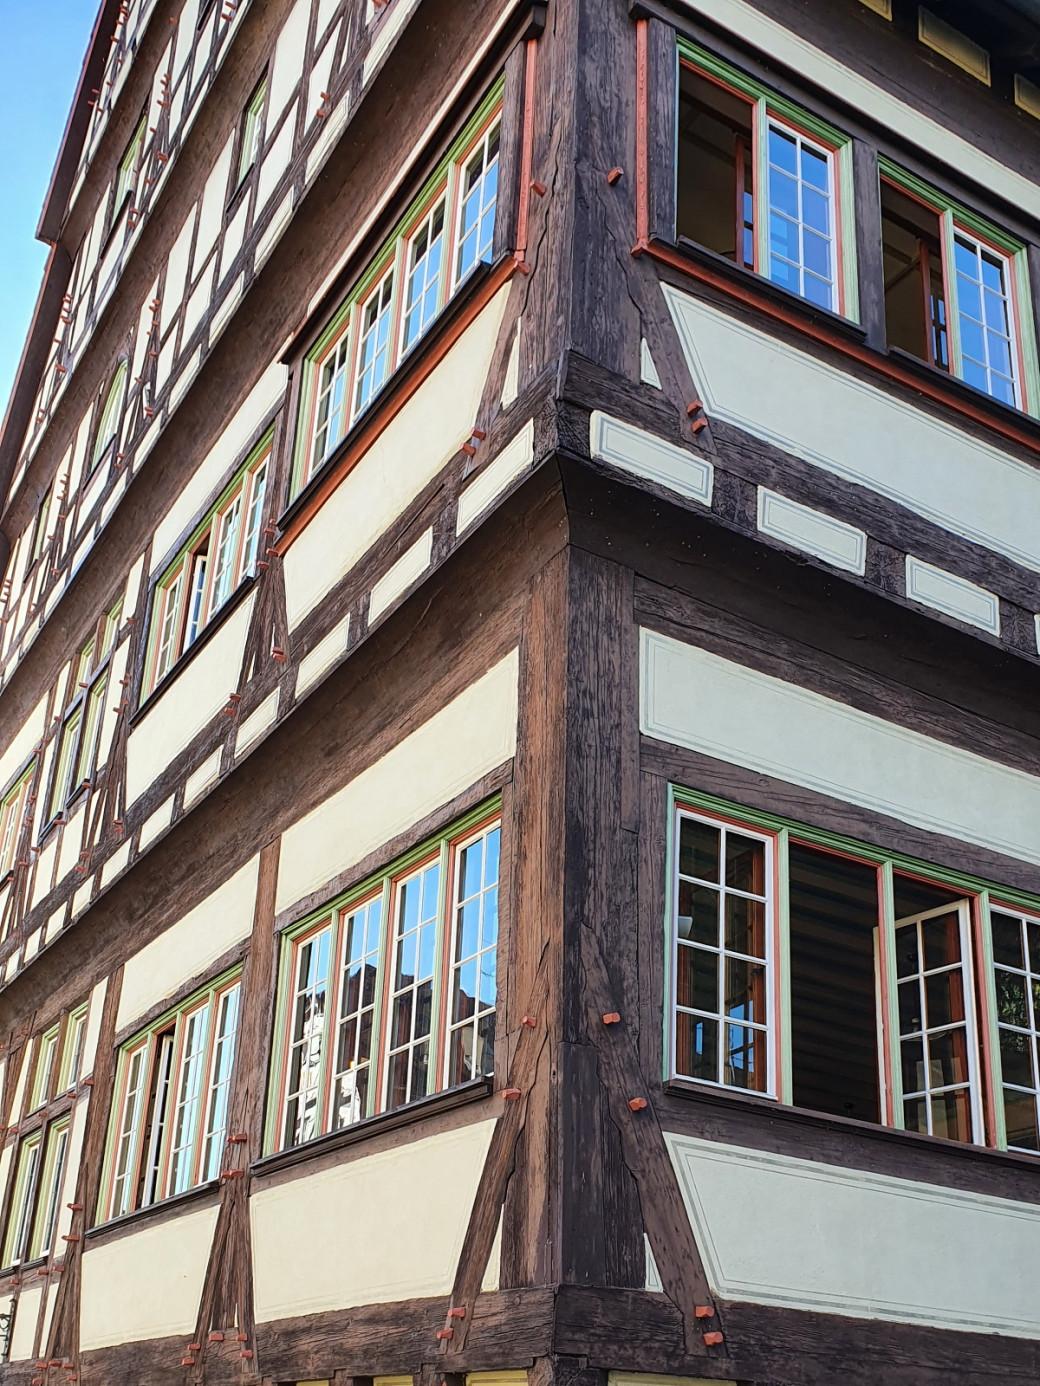 """Hoher Giebel"" Musikschulgebäude, Eckansicht"